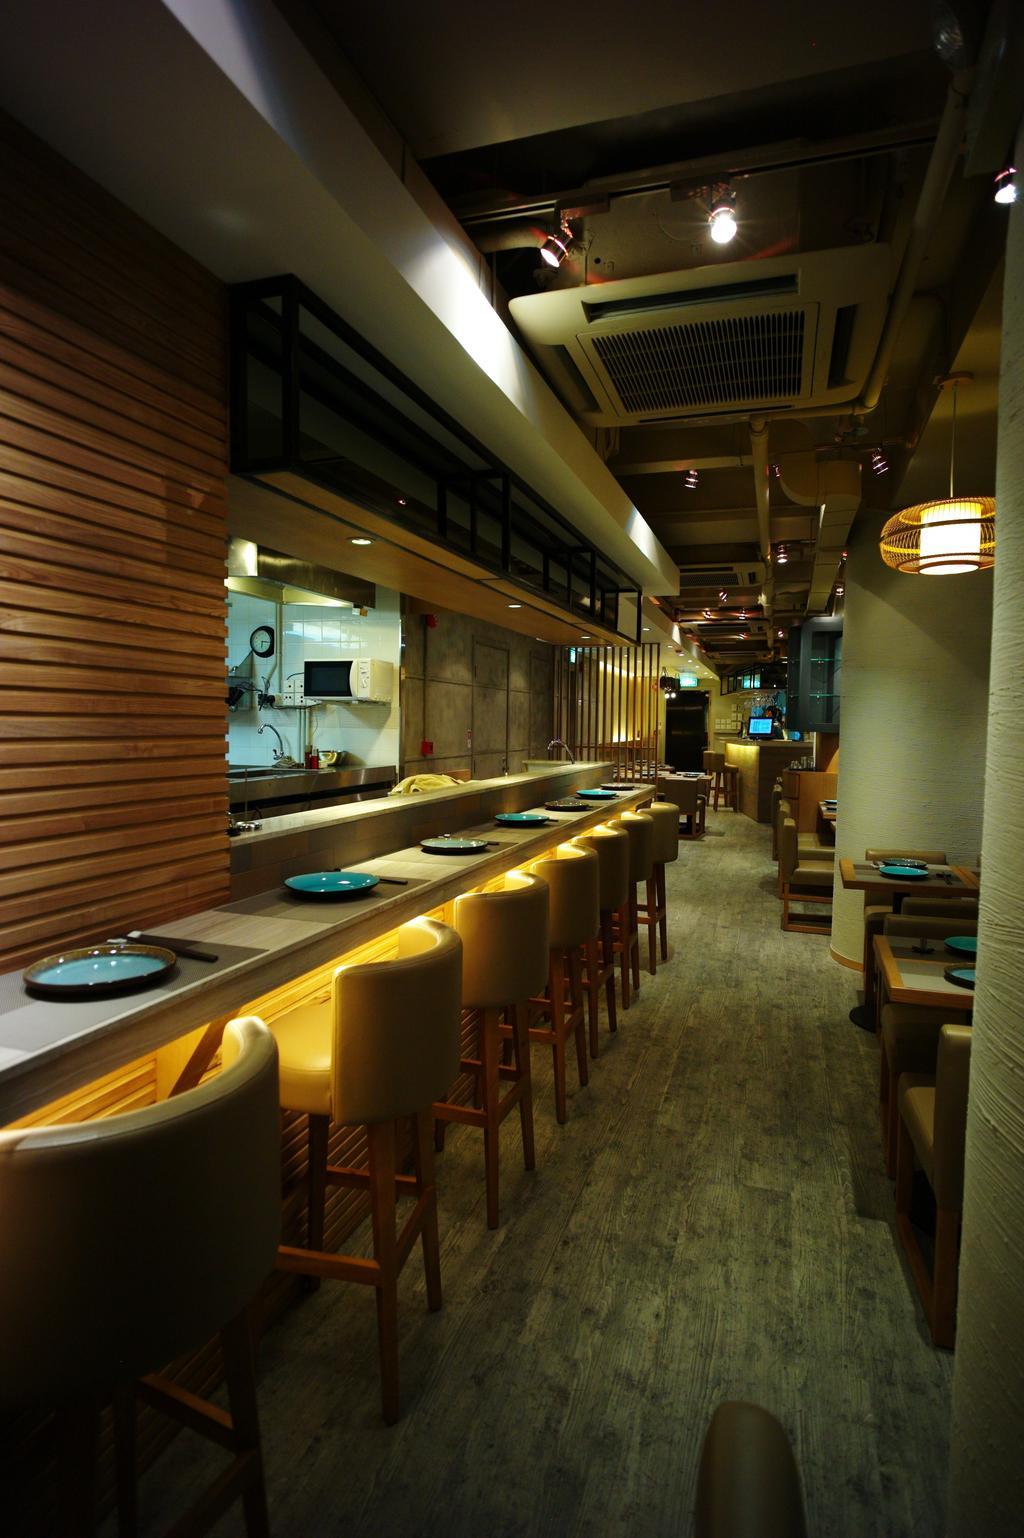 日本餐廳, 商用, 室內設計師, 皓室內設計, 傳統, Diner, Food, Meal, Restaurant